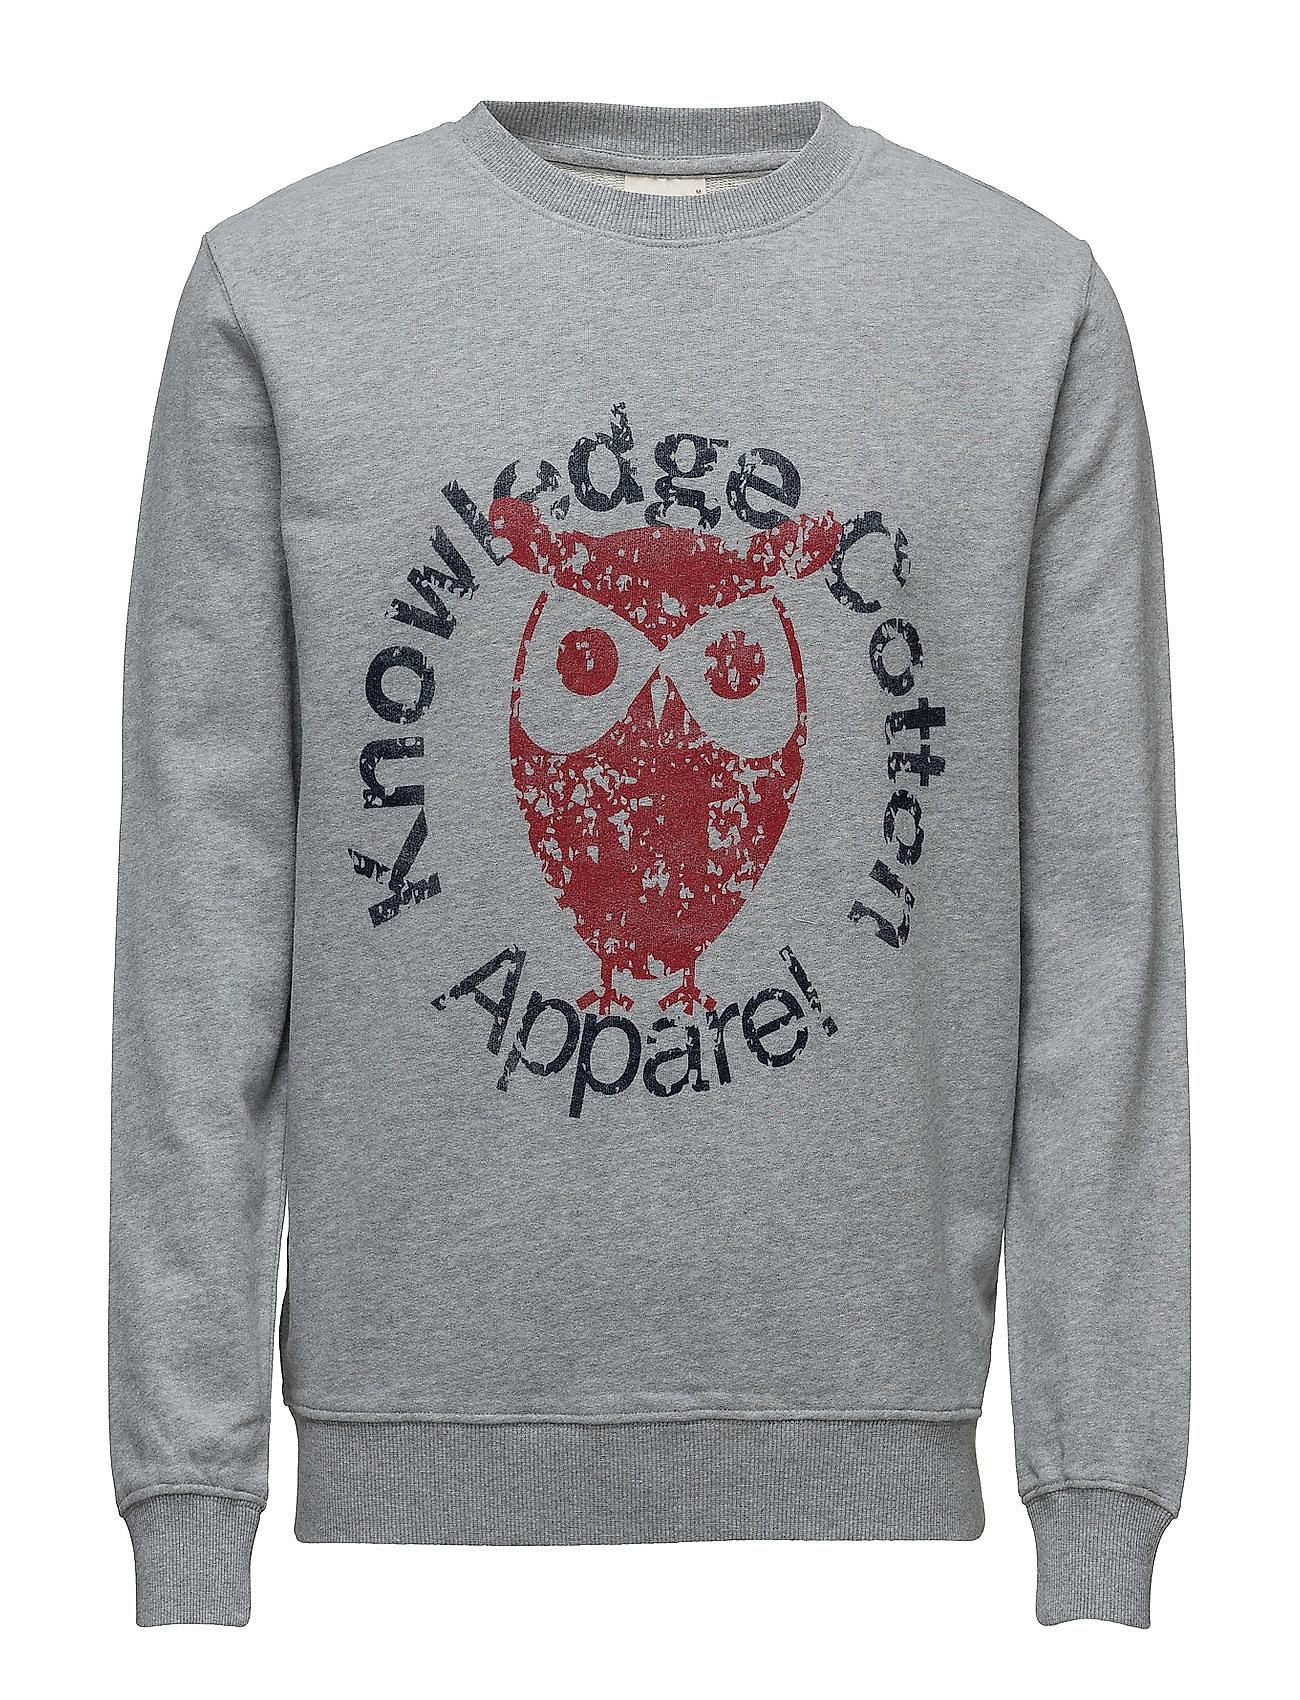 Sweat W/ Owl Print - Gots Knowledge Cotton Apparel Sweat Byxor